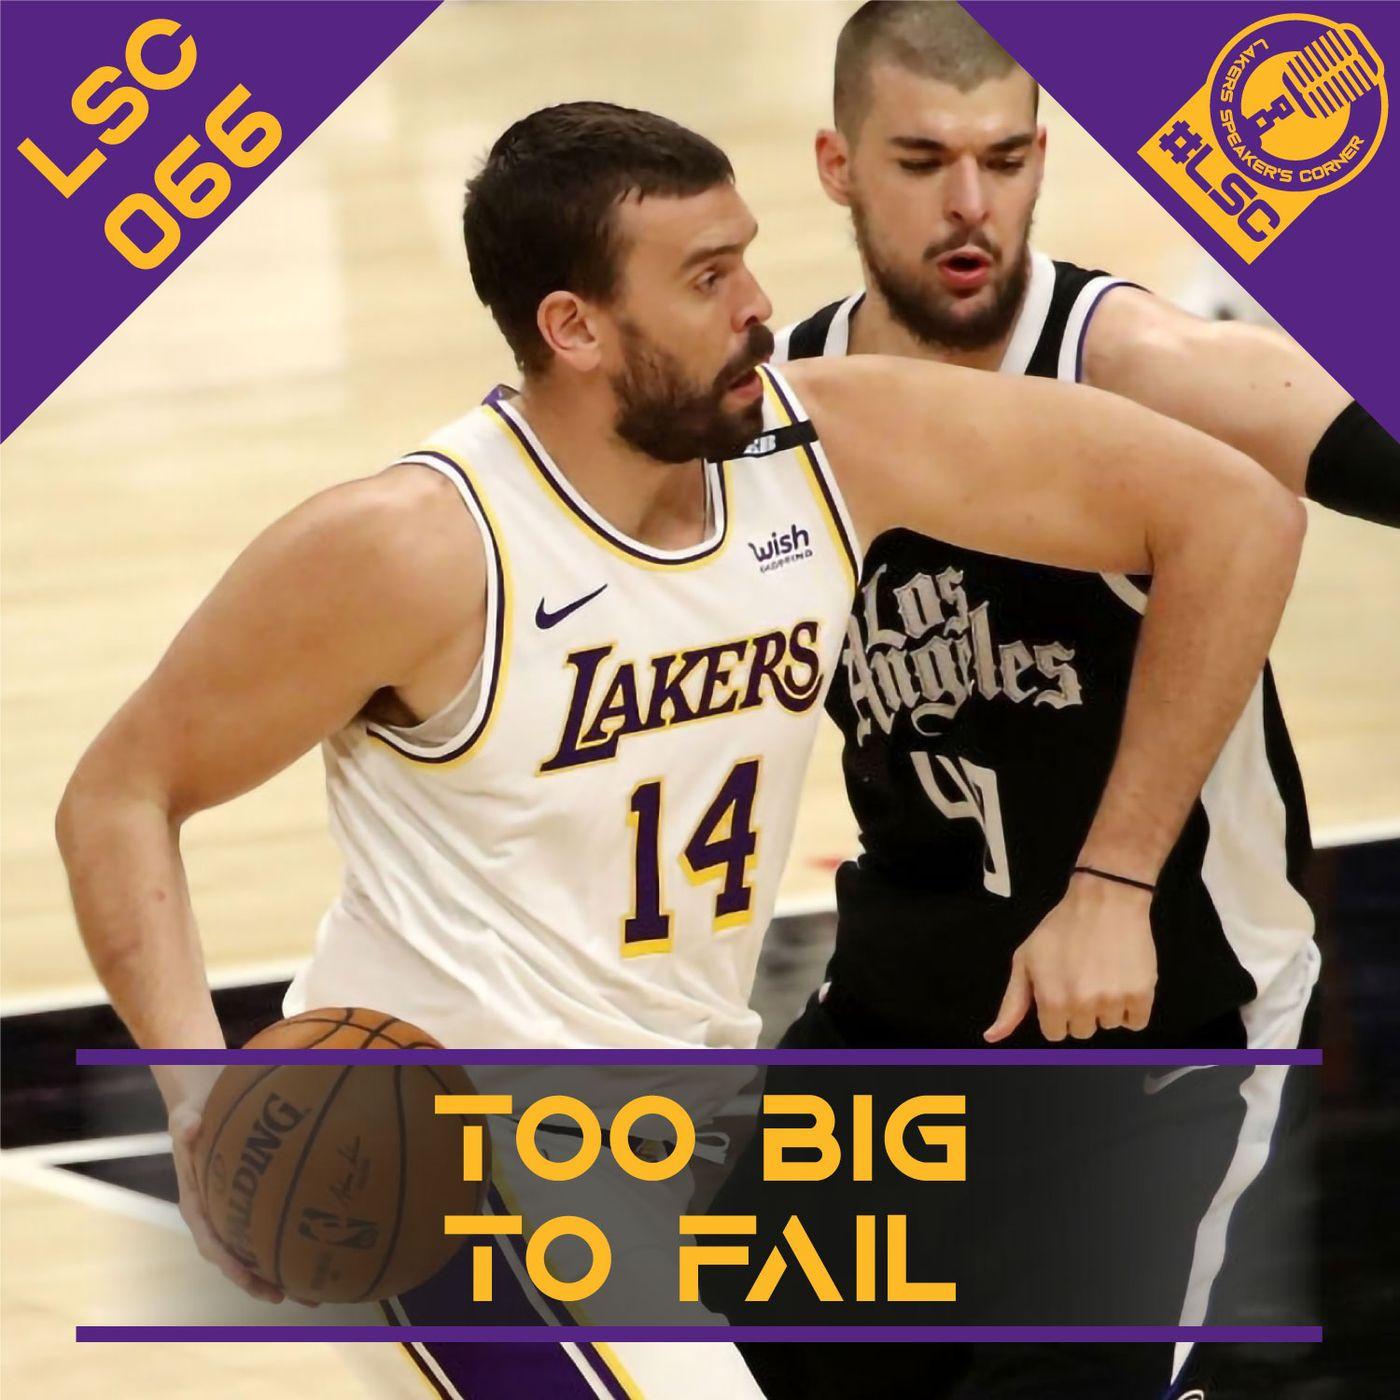 LSC 066 - Too Big to Fail